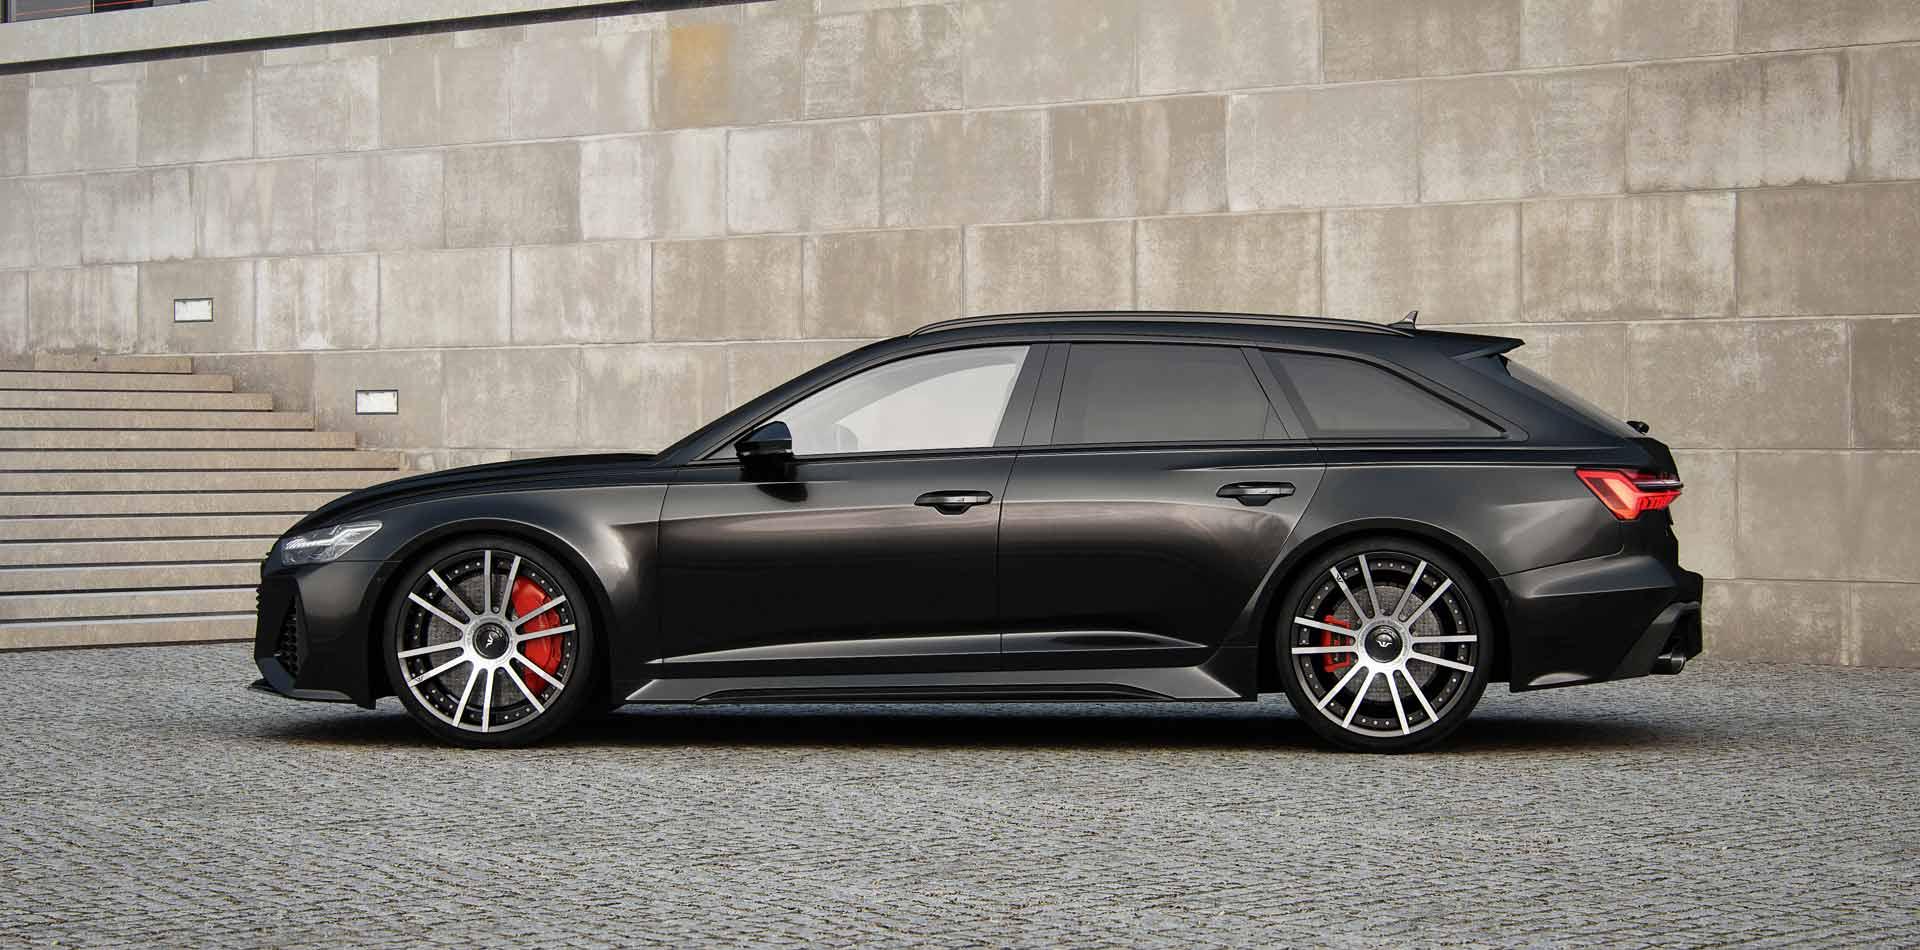 Audi-RS6-Avant-by-Wheelsandmore-5